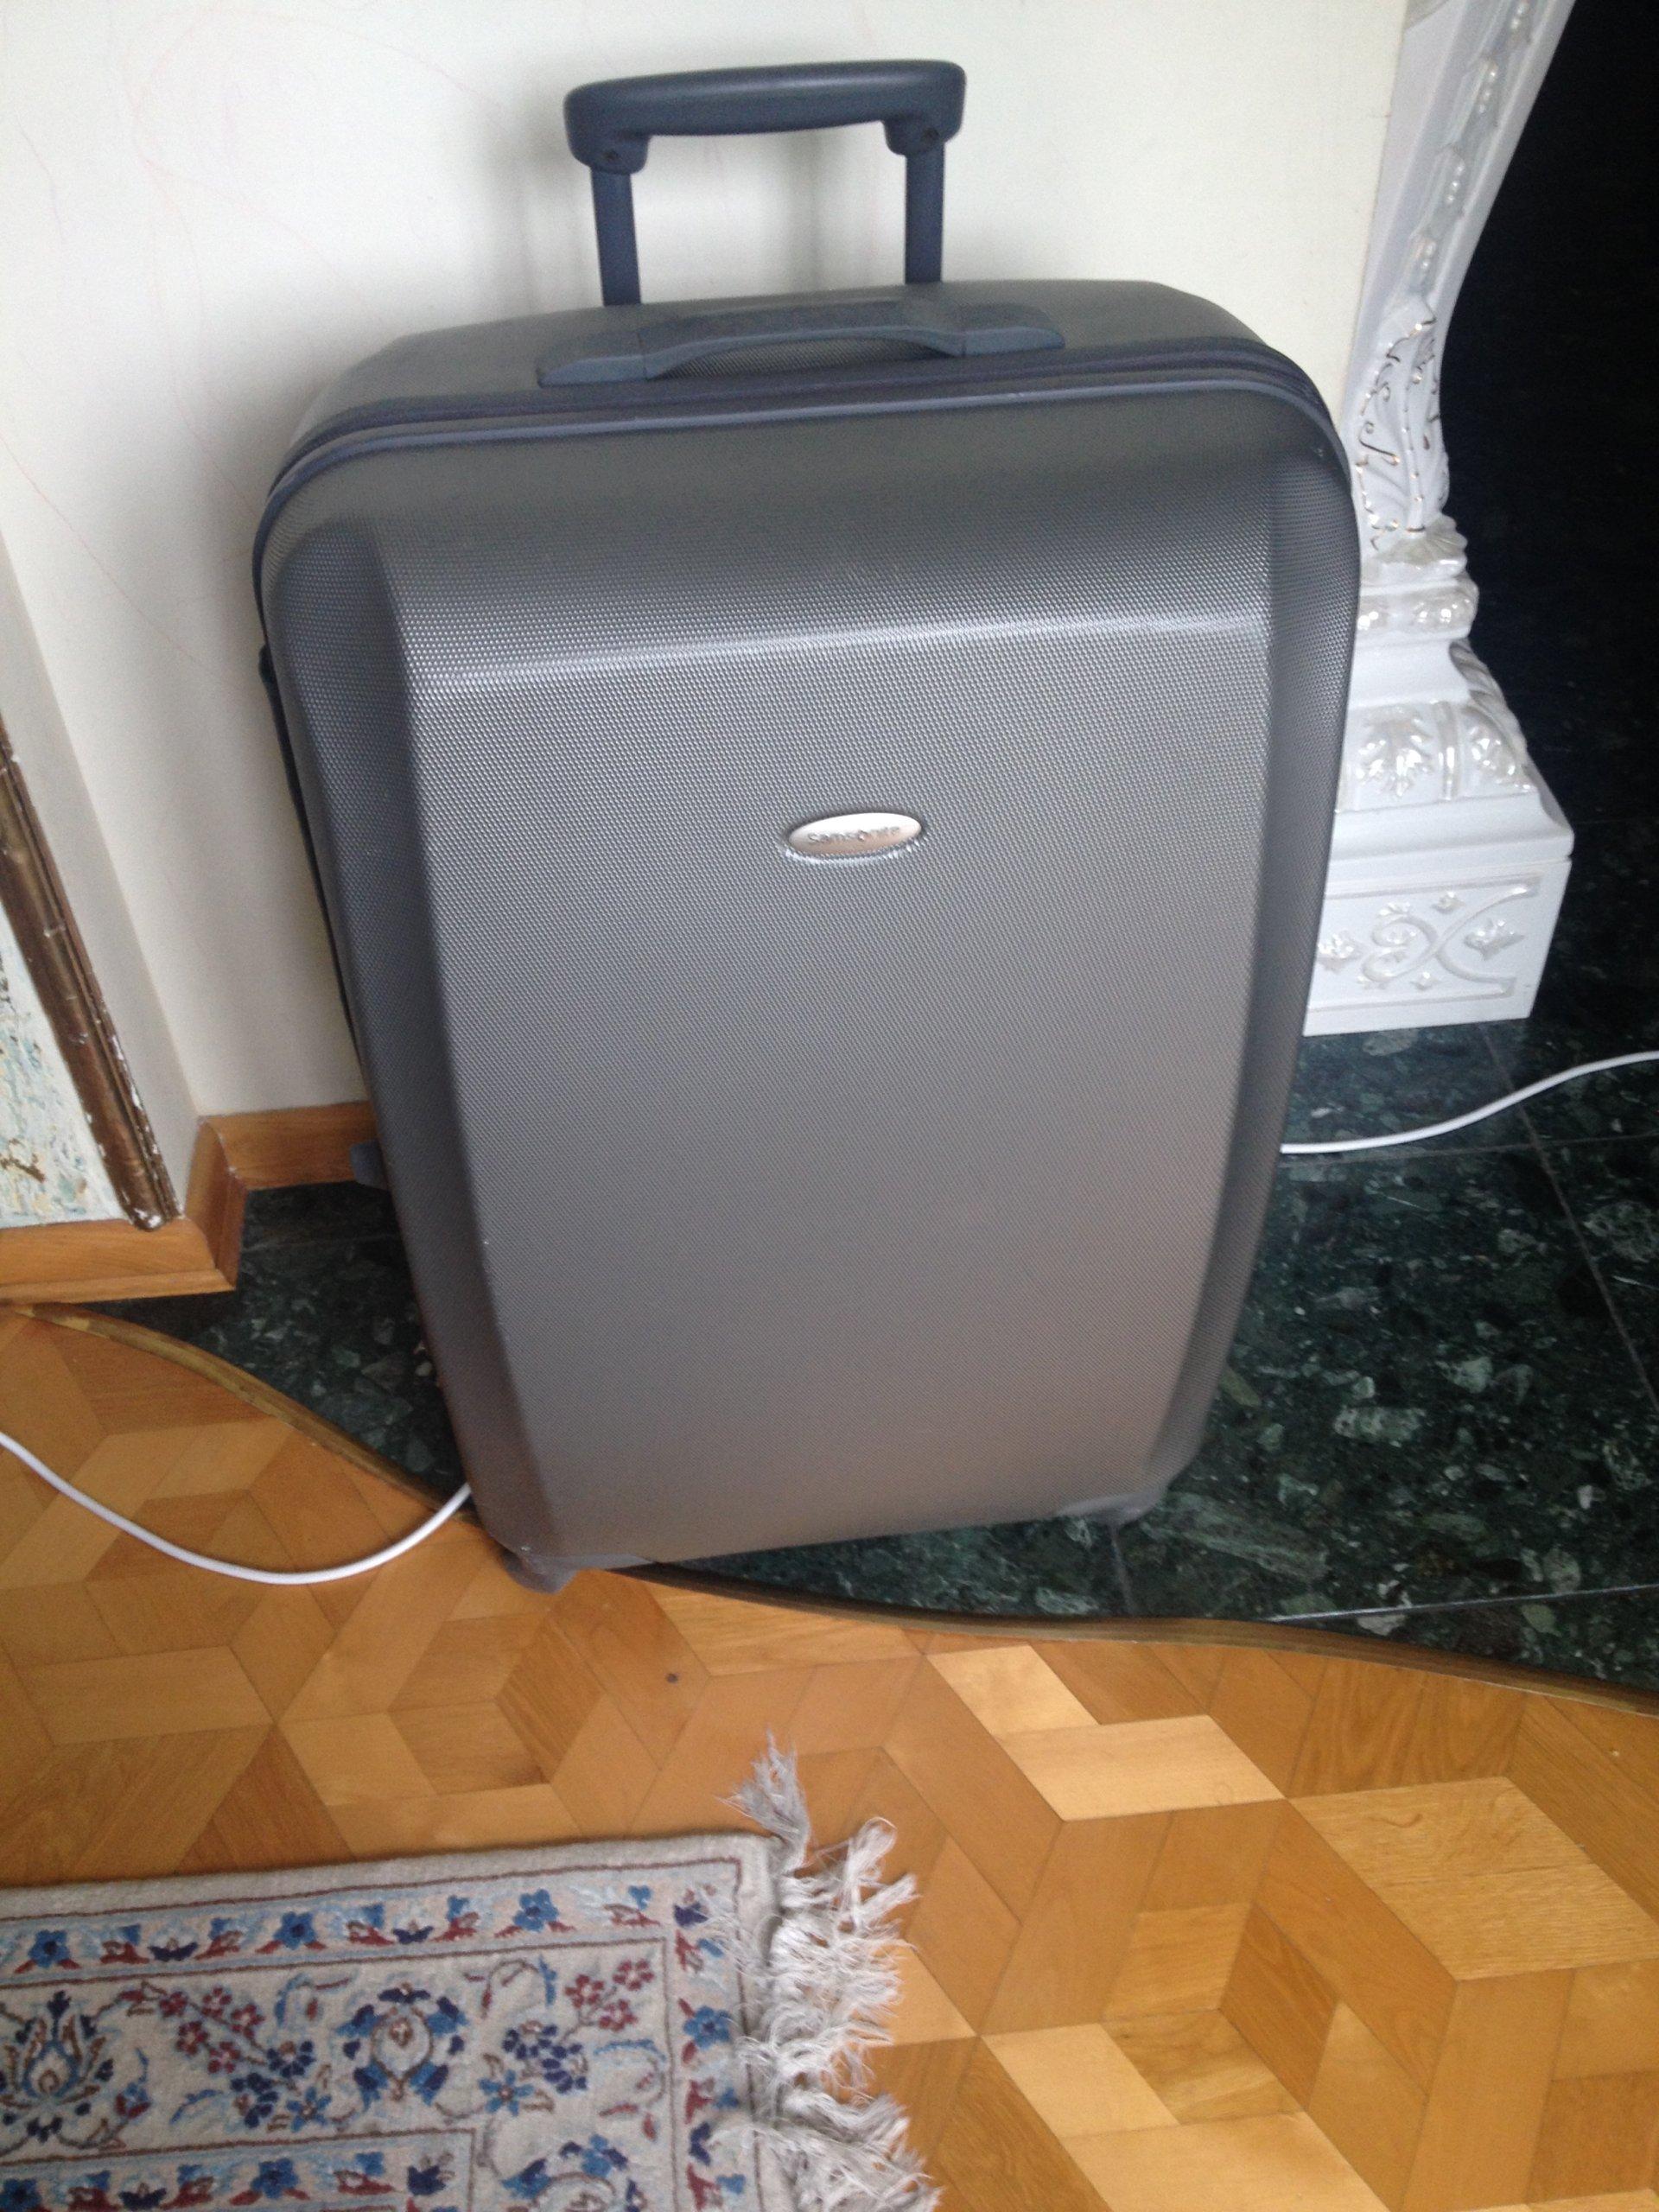 bee3c8dfc63a6 Walizka bagaż SAMSONITE na kółkach - 7352179752 - oficjalne ...